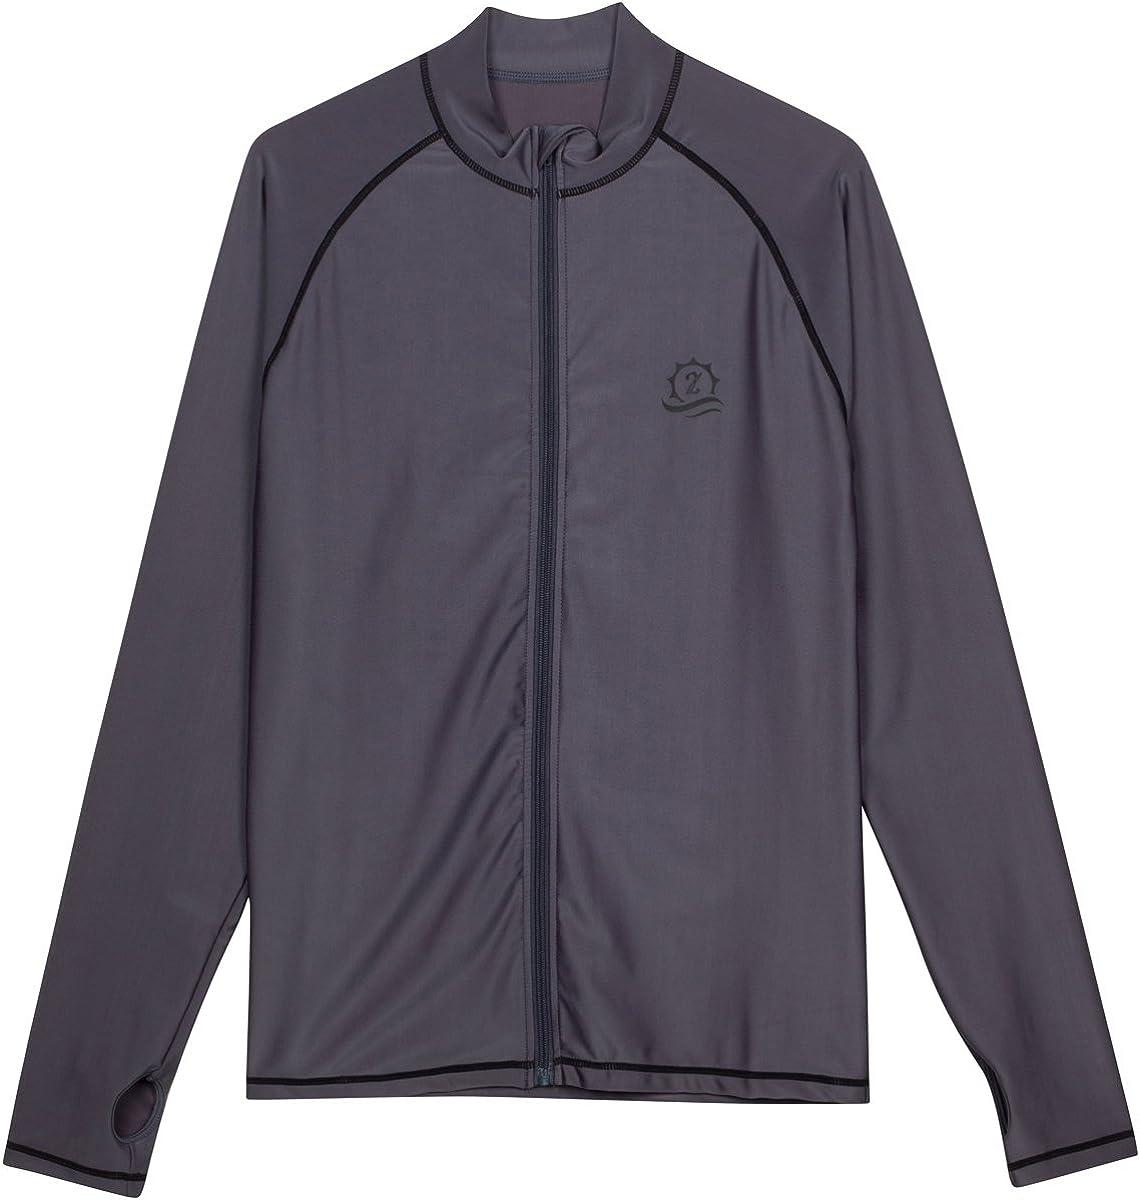 SwimZip Men's Long Sleeve Zipper Rash Multiple 2021 spring and summer new Industry No. 1 Guard 50+ Co UPF